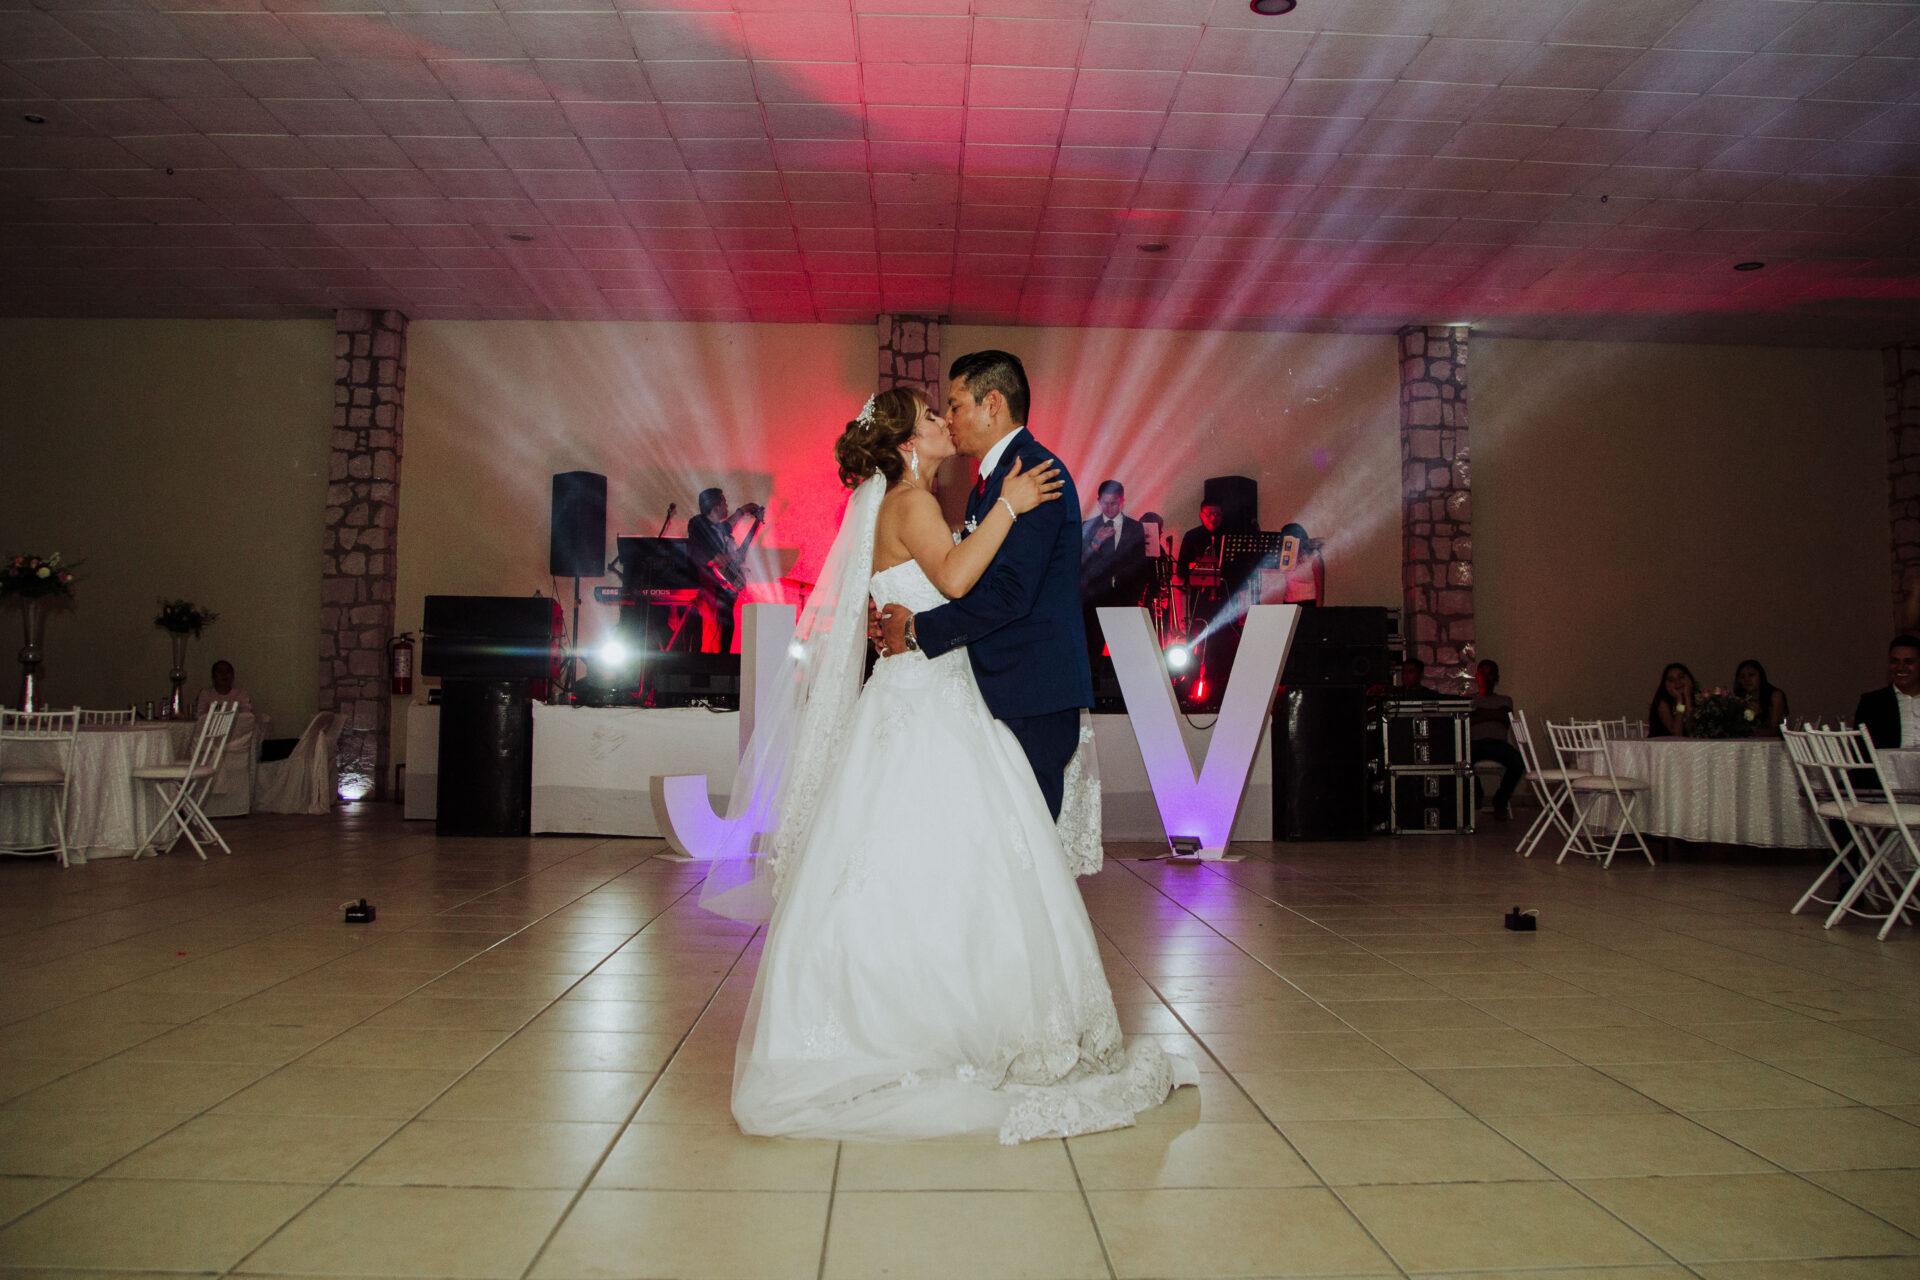 javier_noriega_fotografo_bodas_zacatecas_jerez00023